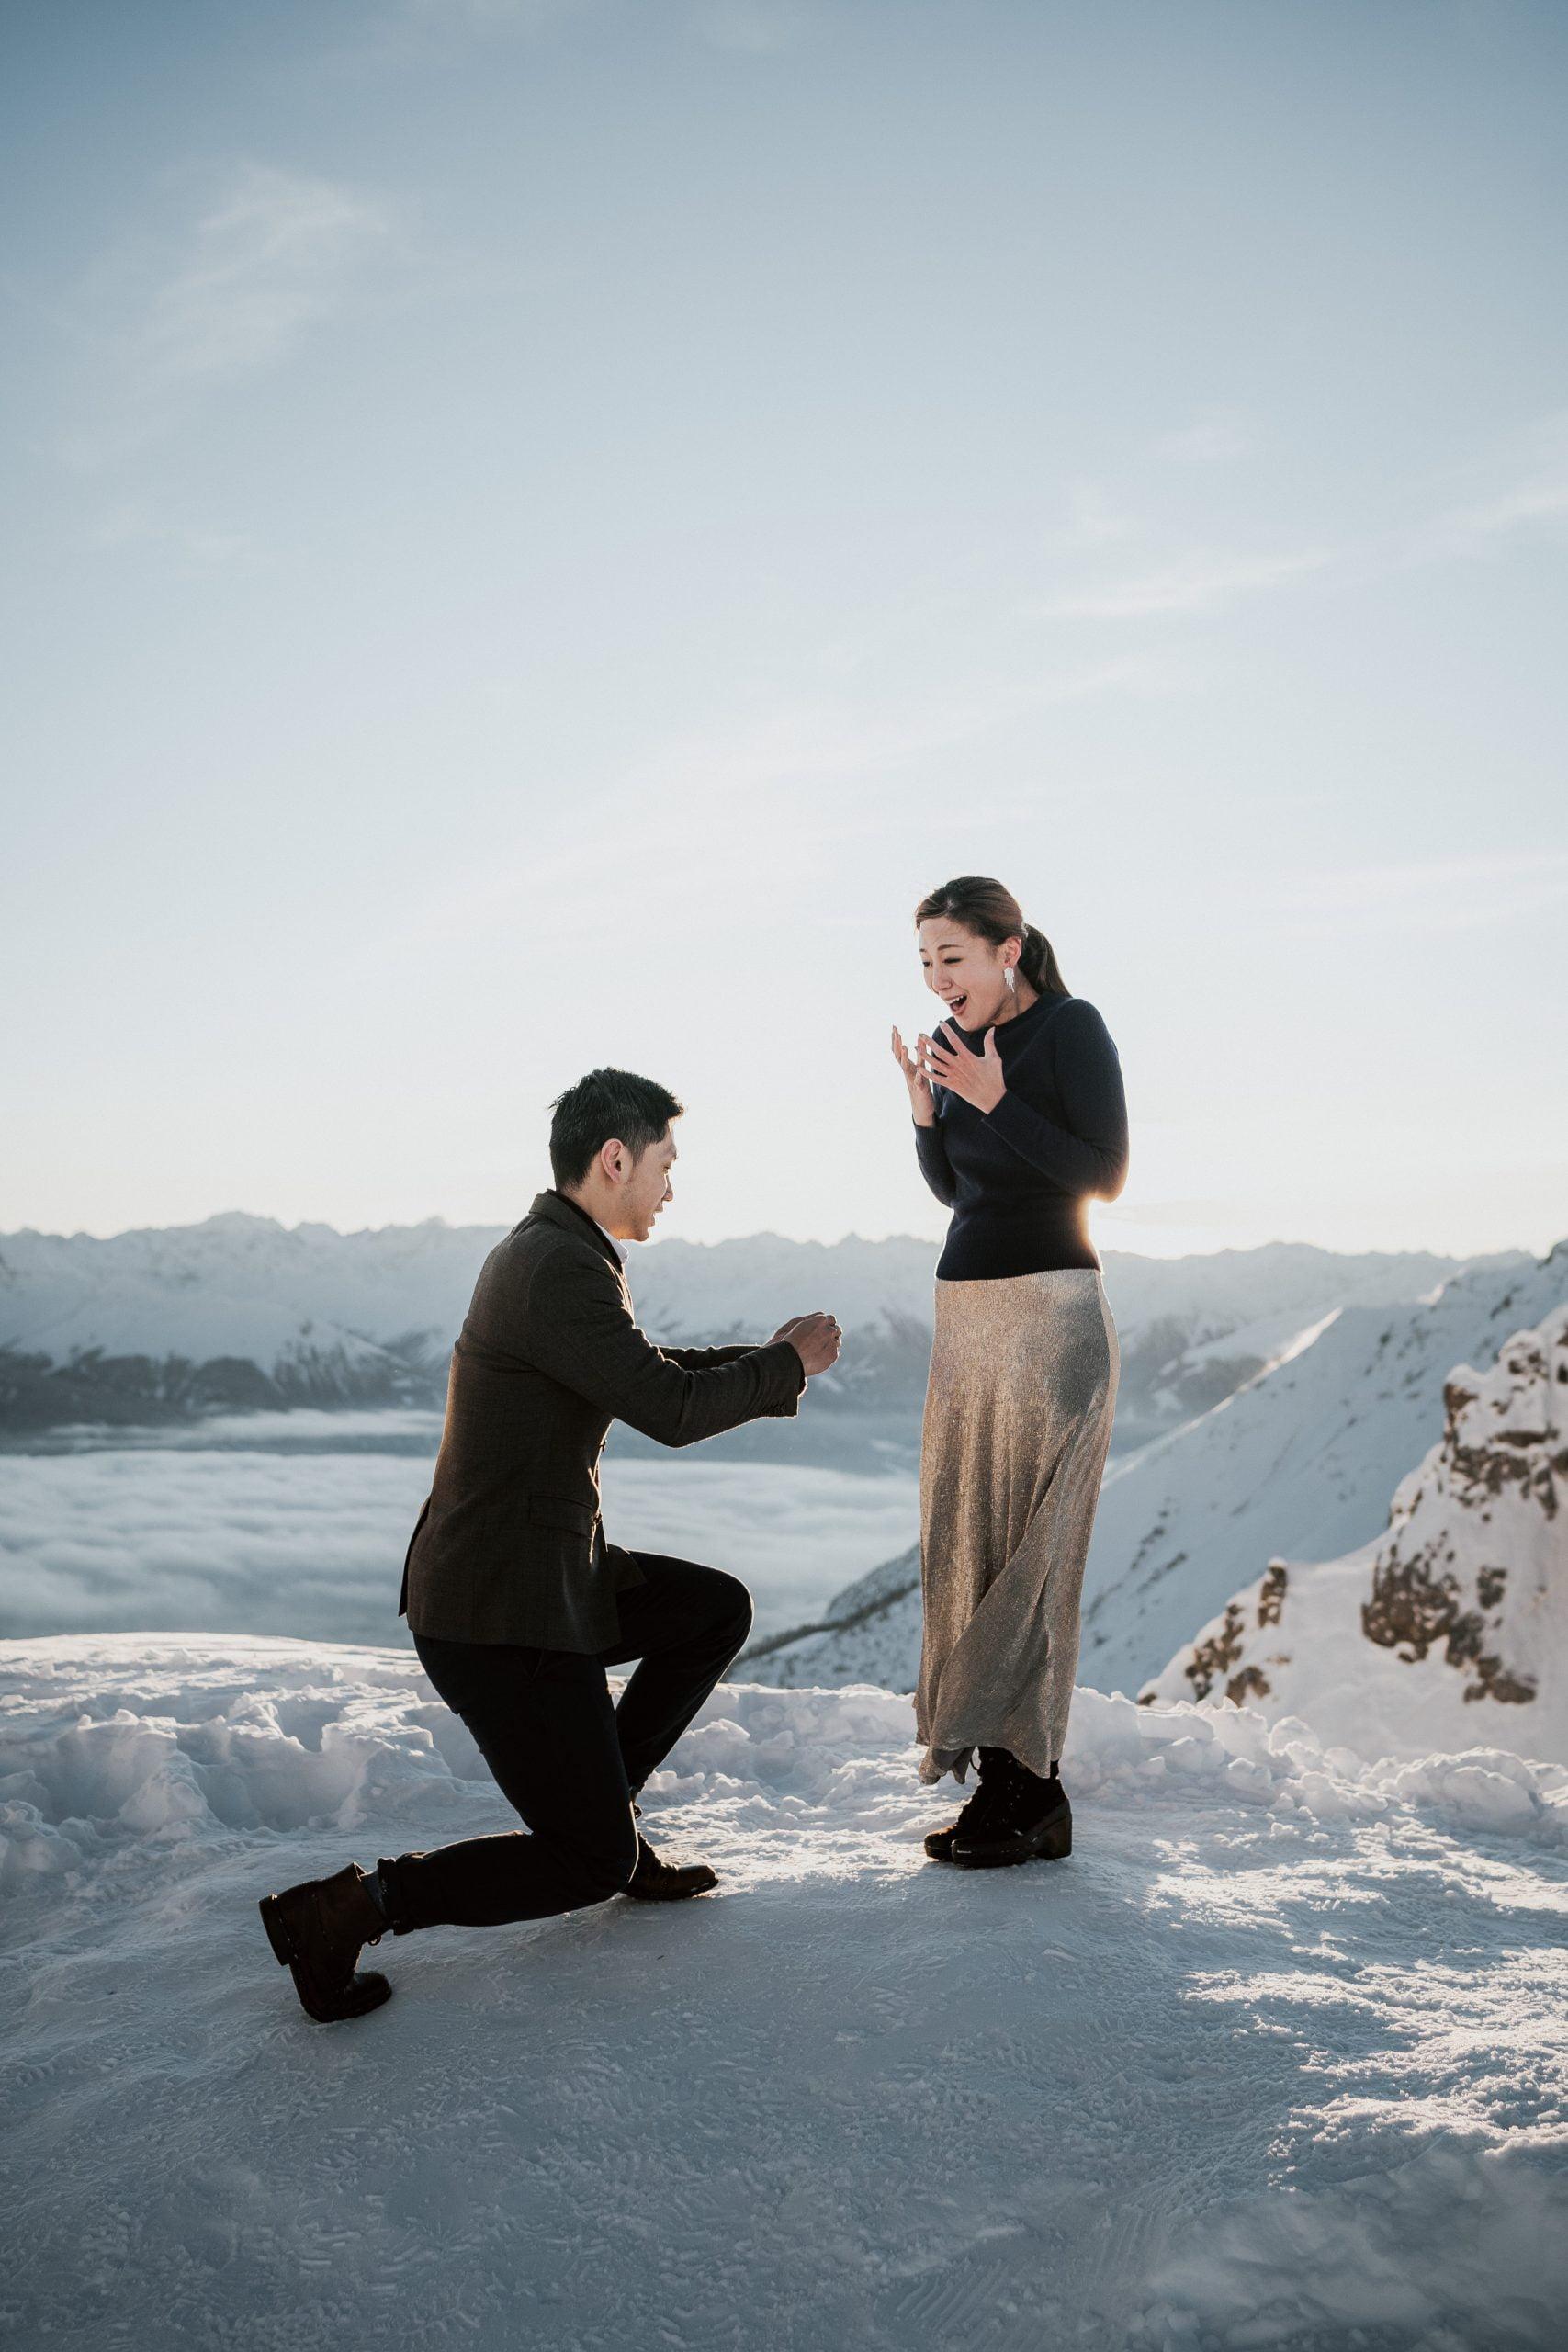 Blitzkneisser-Engagement-Shooting-Nordkette-Innsbruck-Photo-72